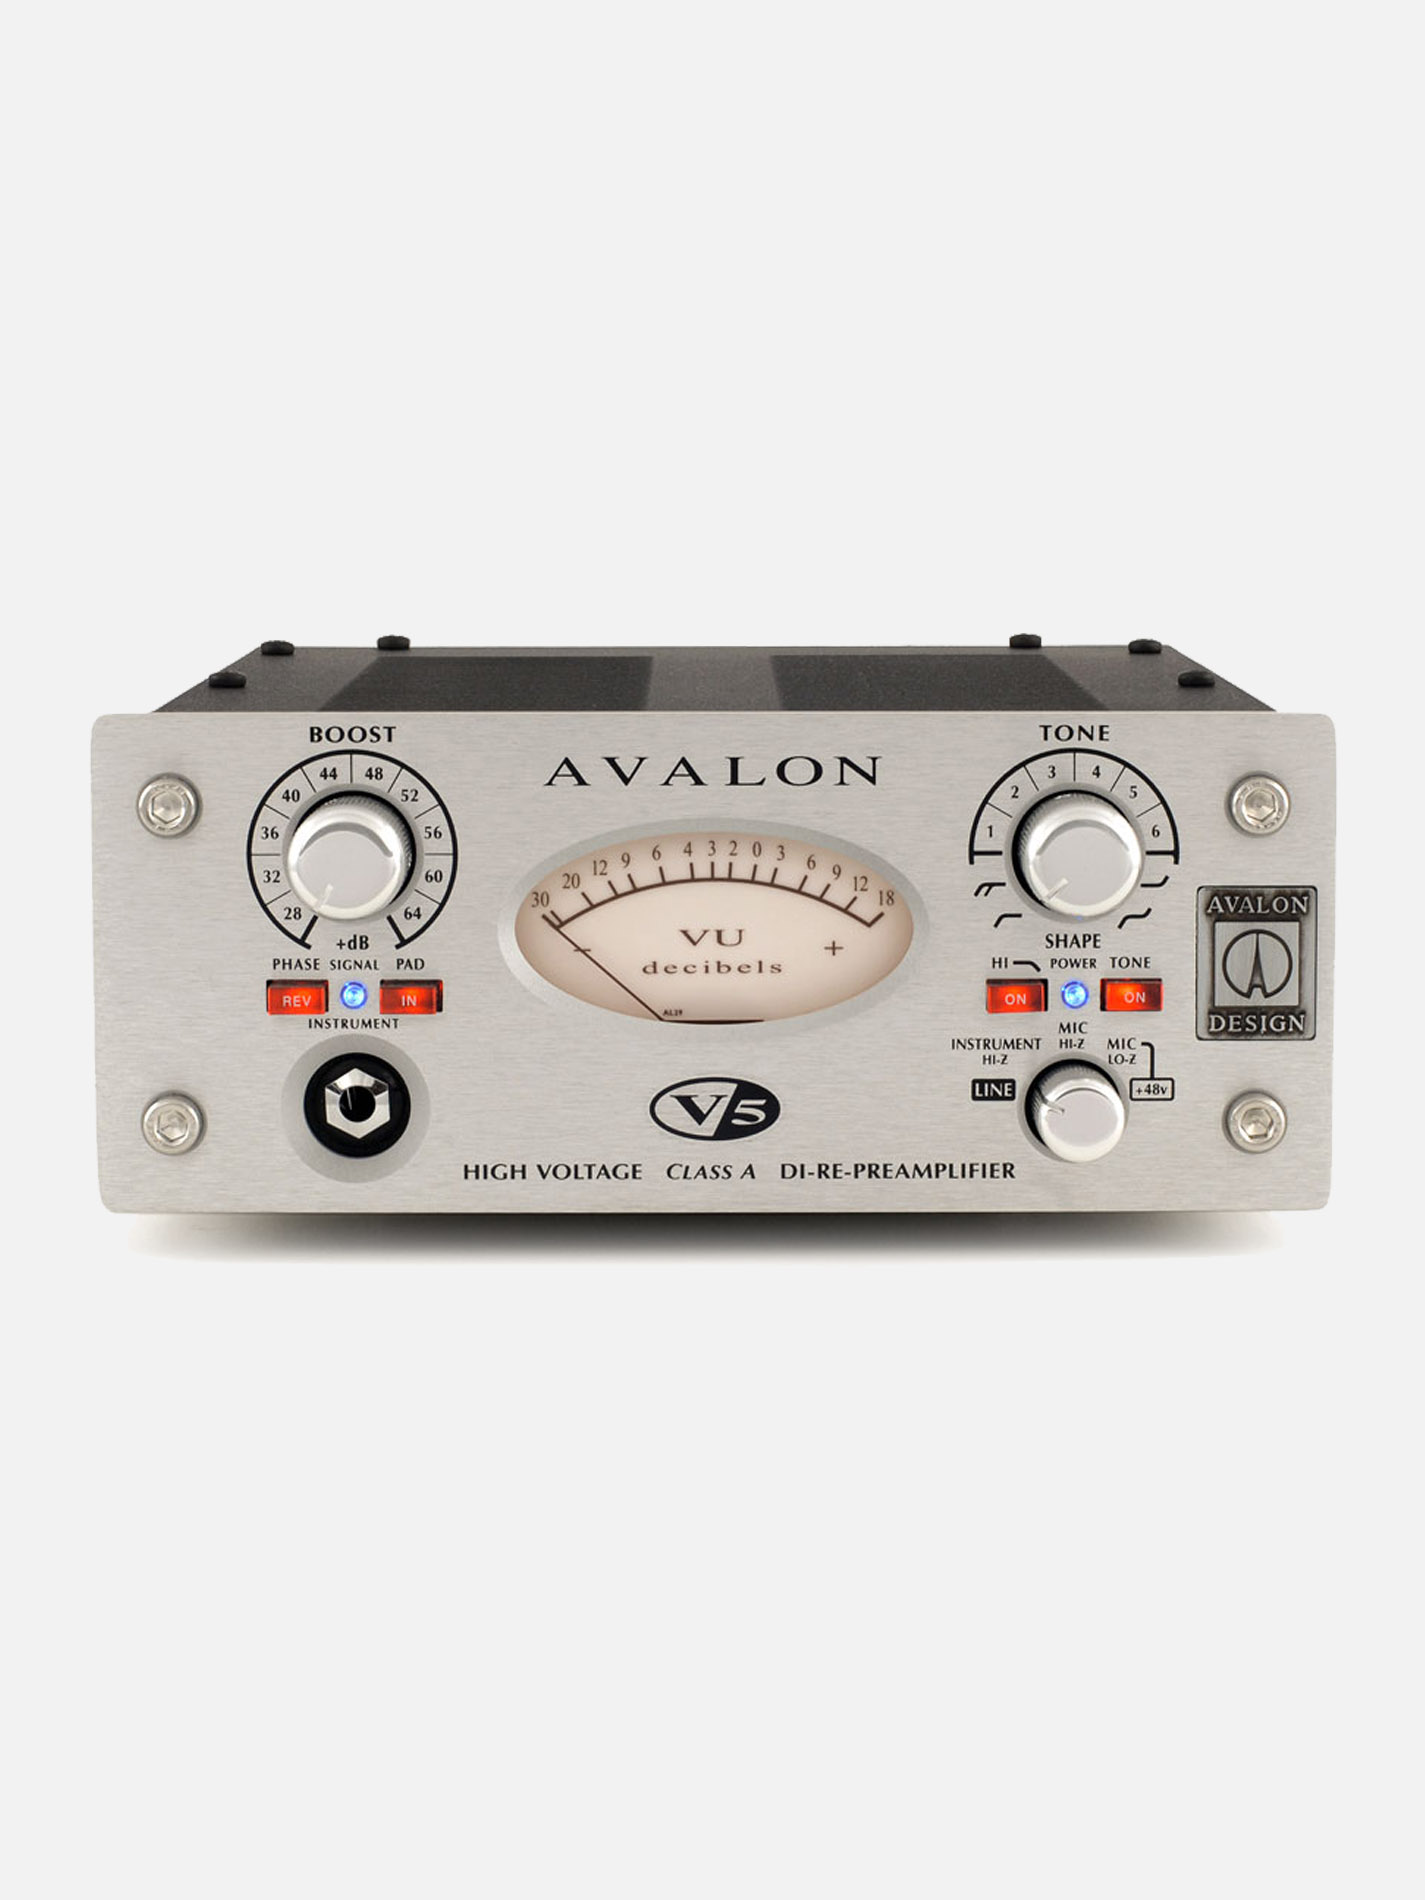 AVALON – V5 Preamp DI Reamp